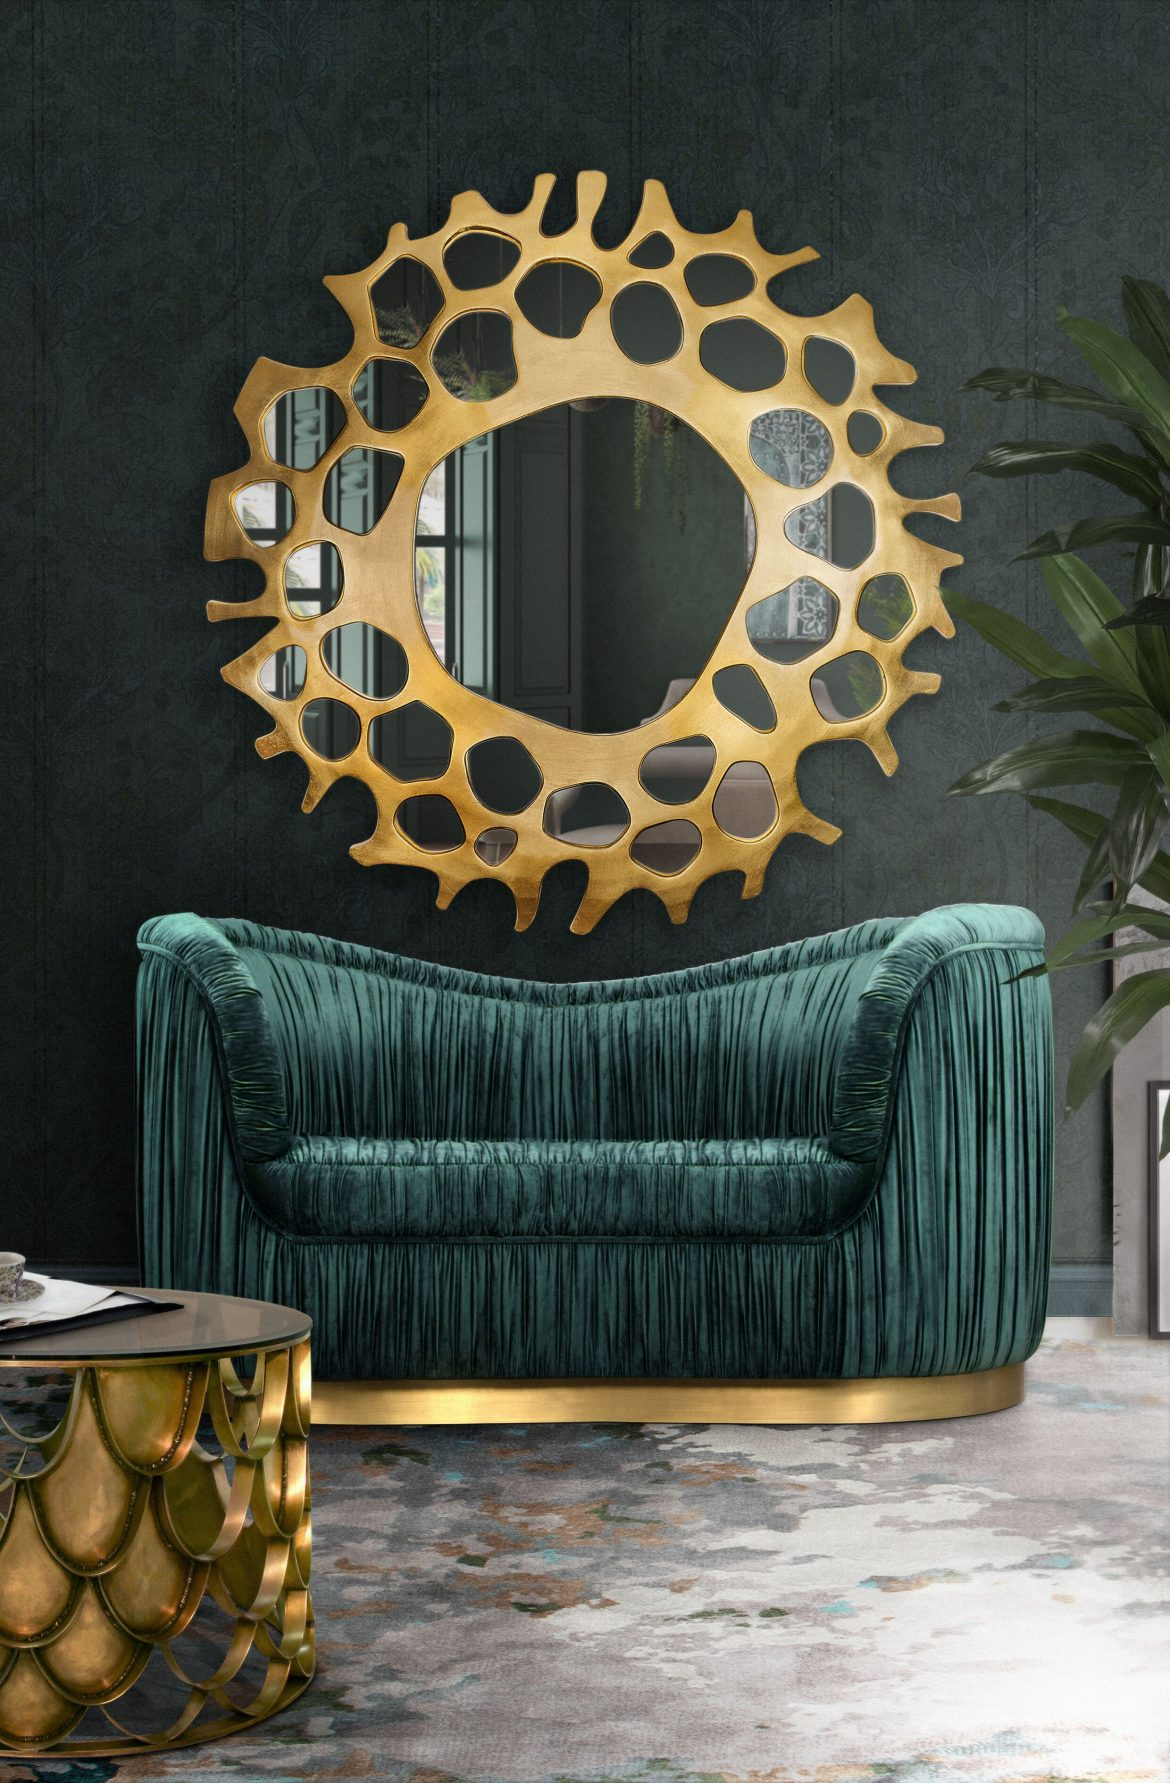 30 Best Living Room Ideas For 2020 living room ideas 30 Best Living Room Ideas For 2020 best living room ideas 2020 1